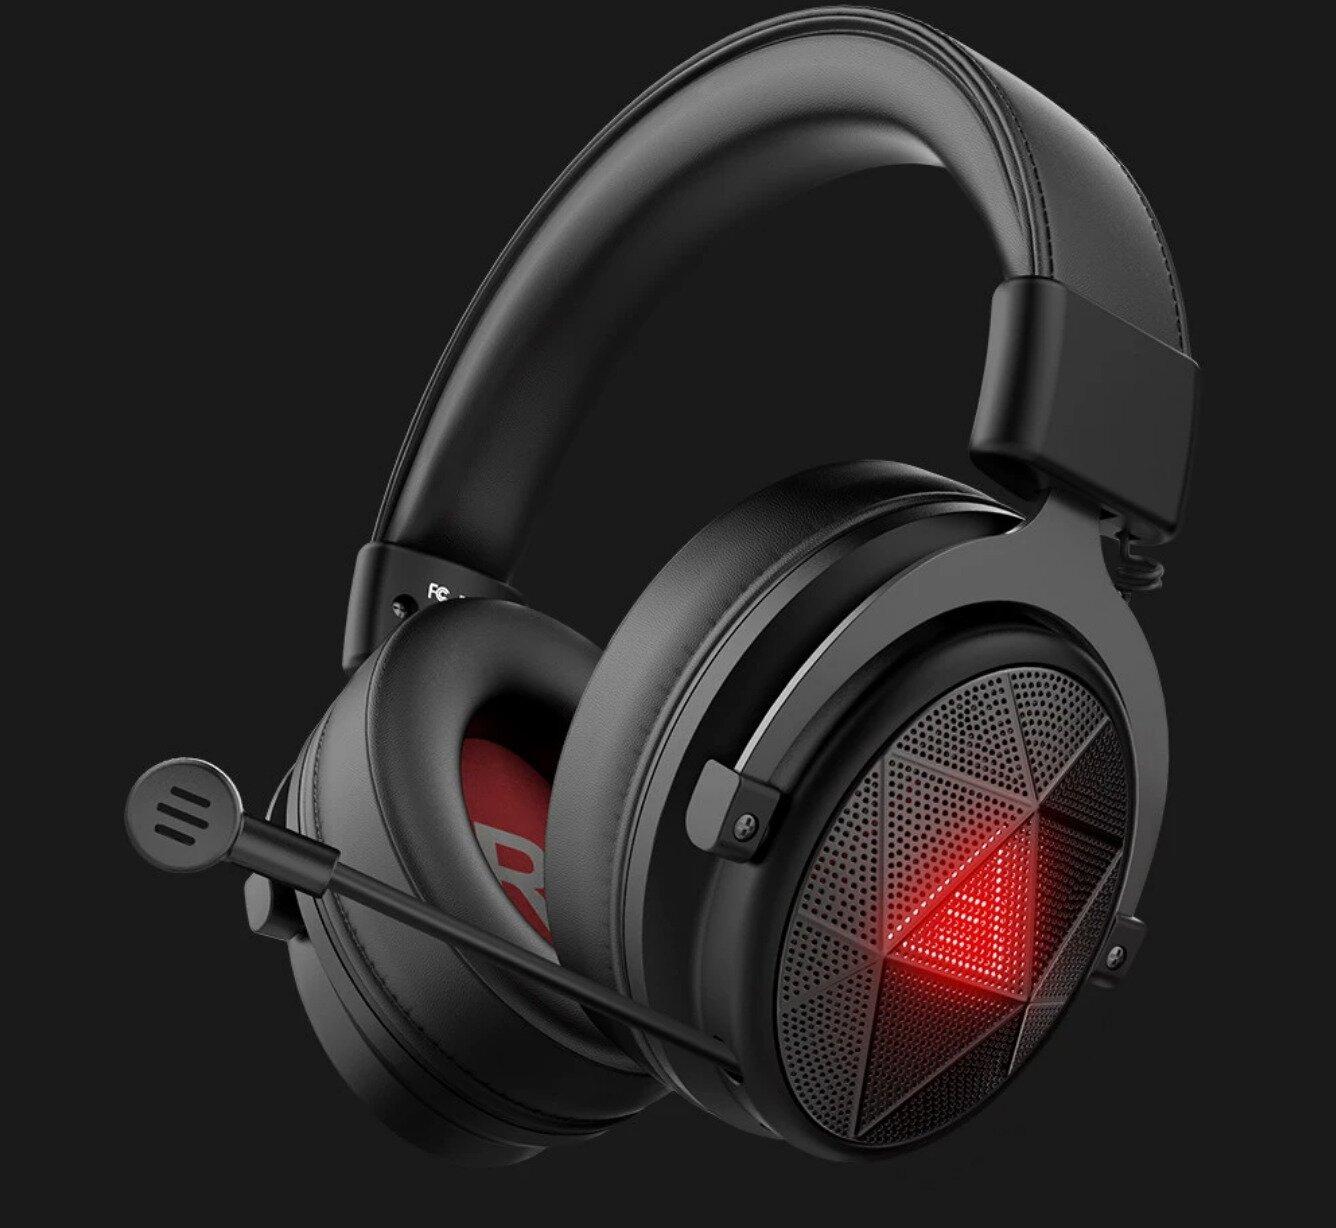 EKSA E910 5.8GHz Wireless Gaming Headset